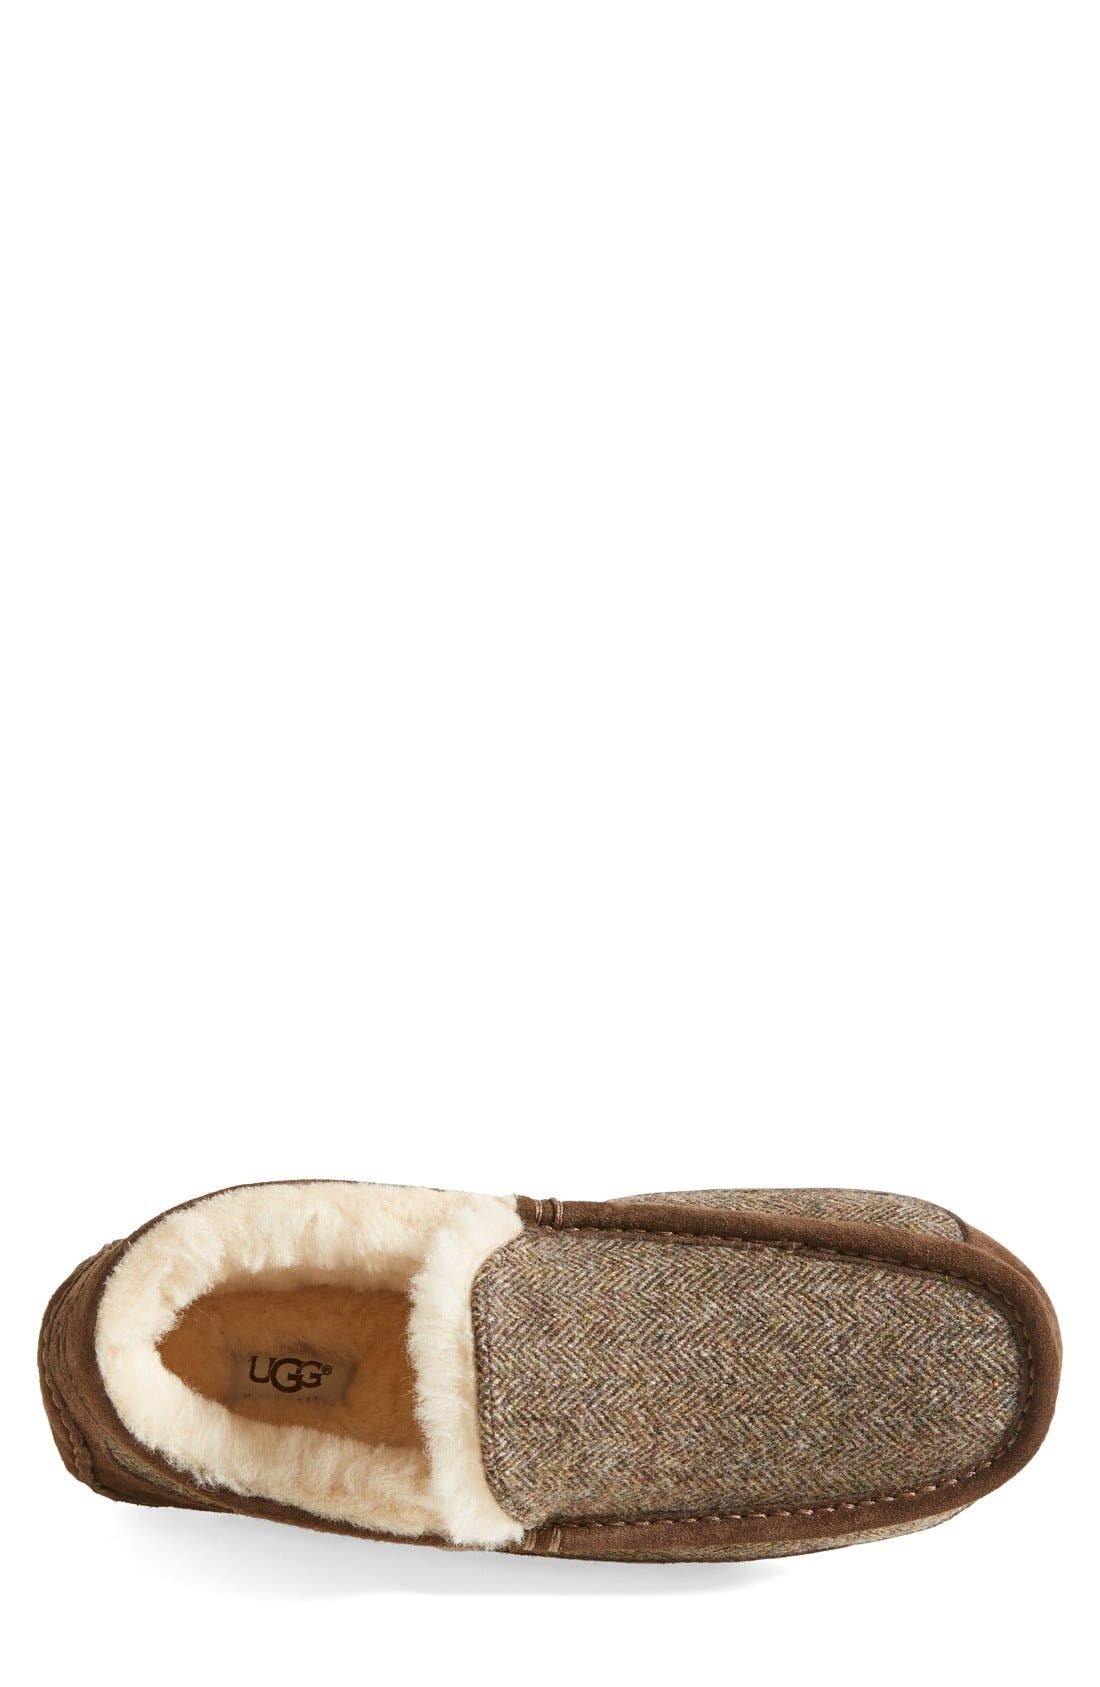 Ascot Tweed Slipper,                             Alternate thumbnail 3, color,                             Stout Tweed